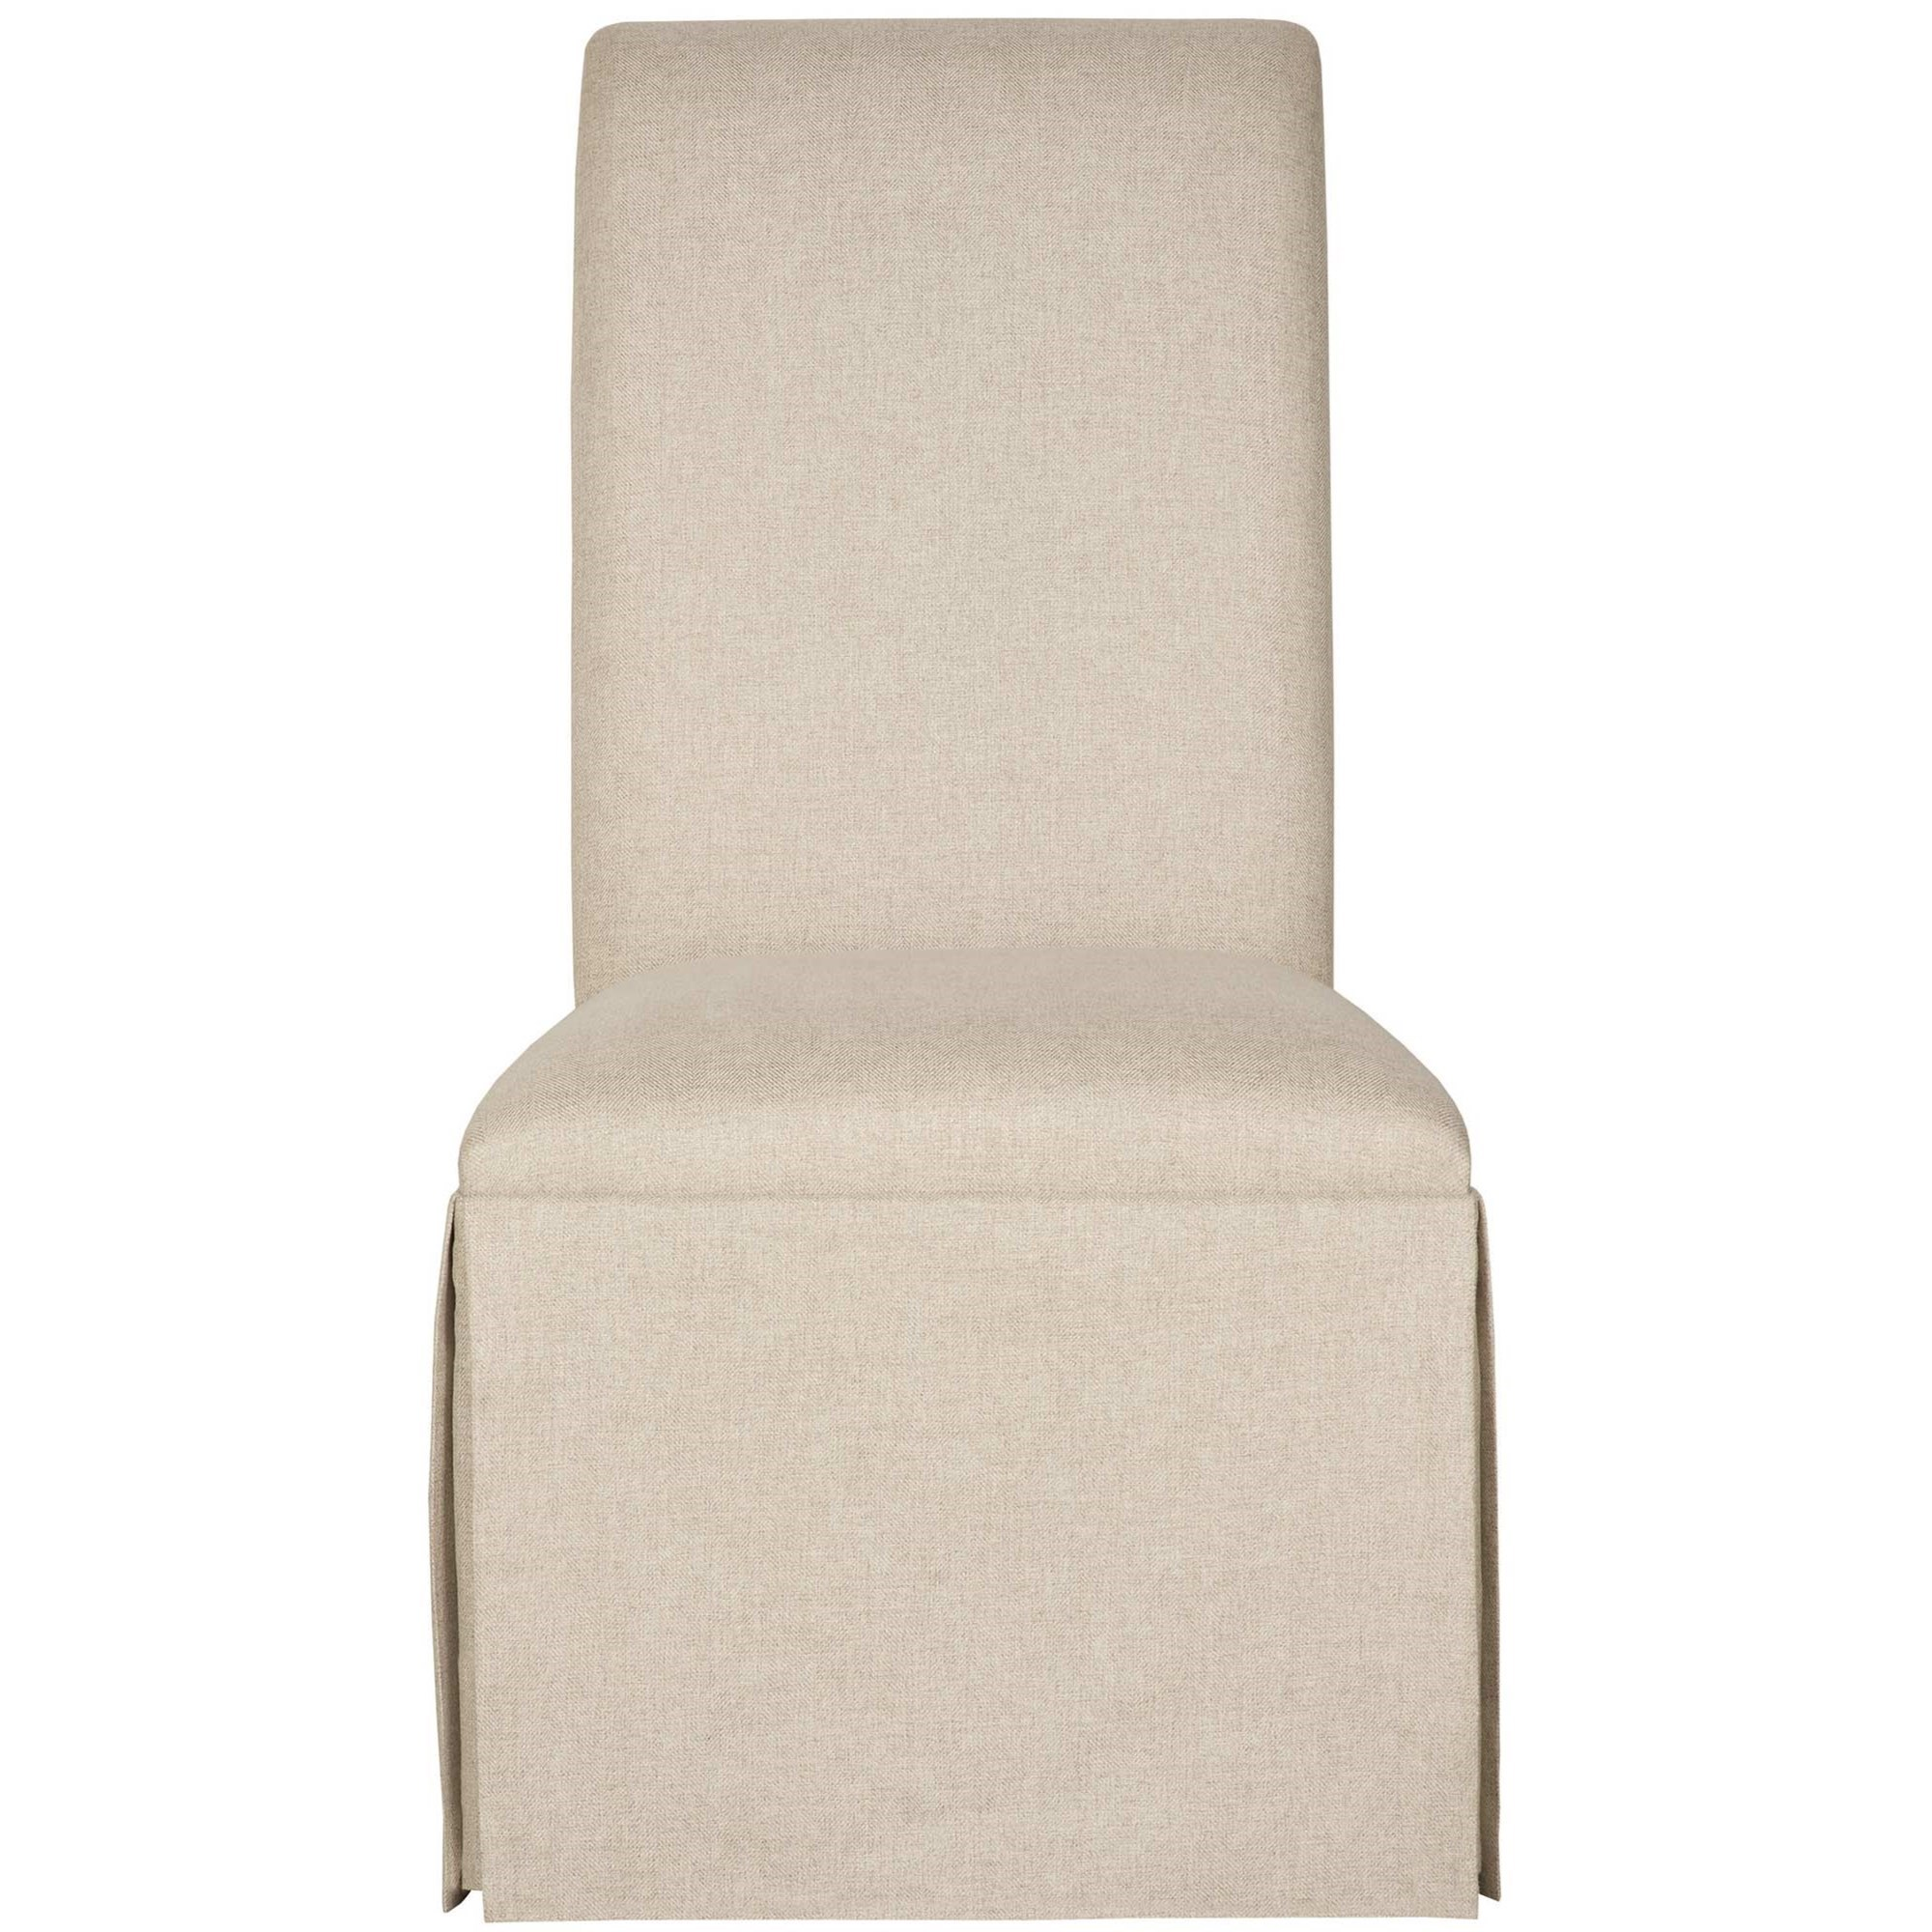 Interiors - Tessa Skirted Side Chair at Williams & Kay